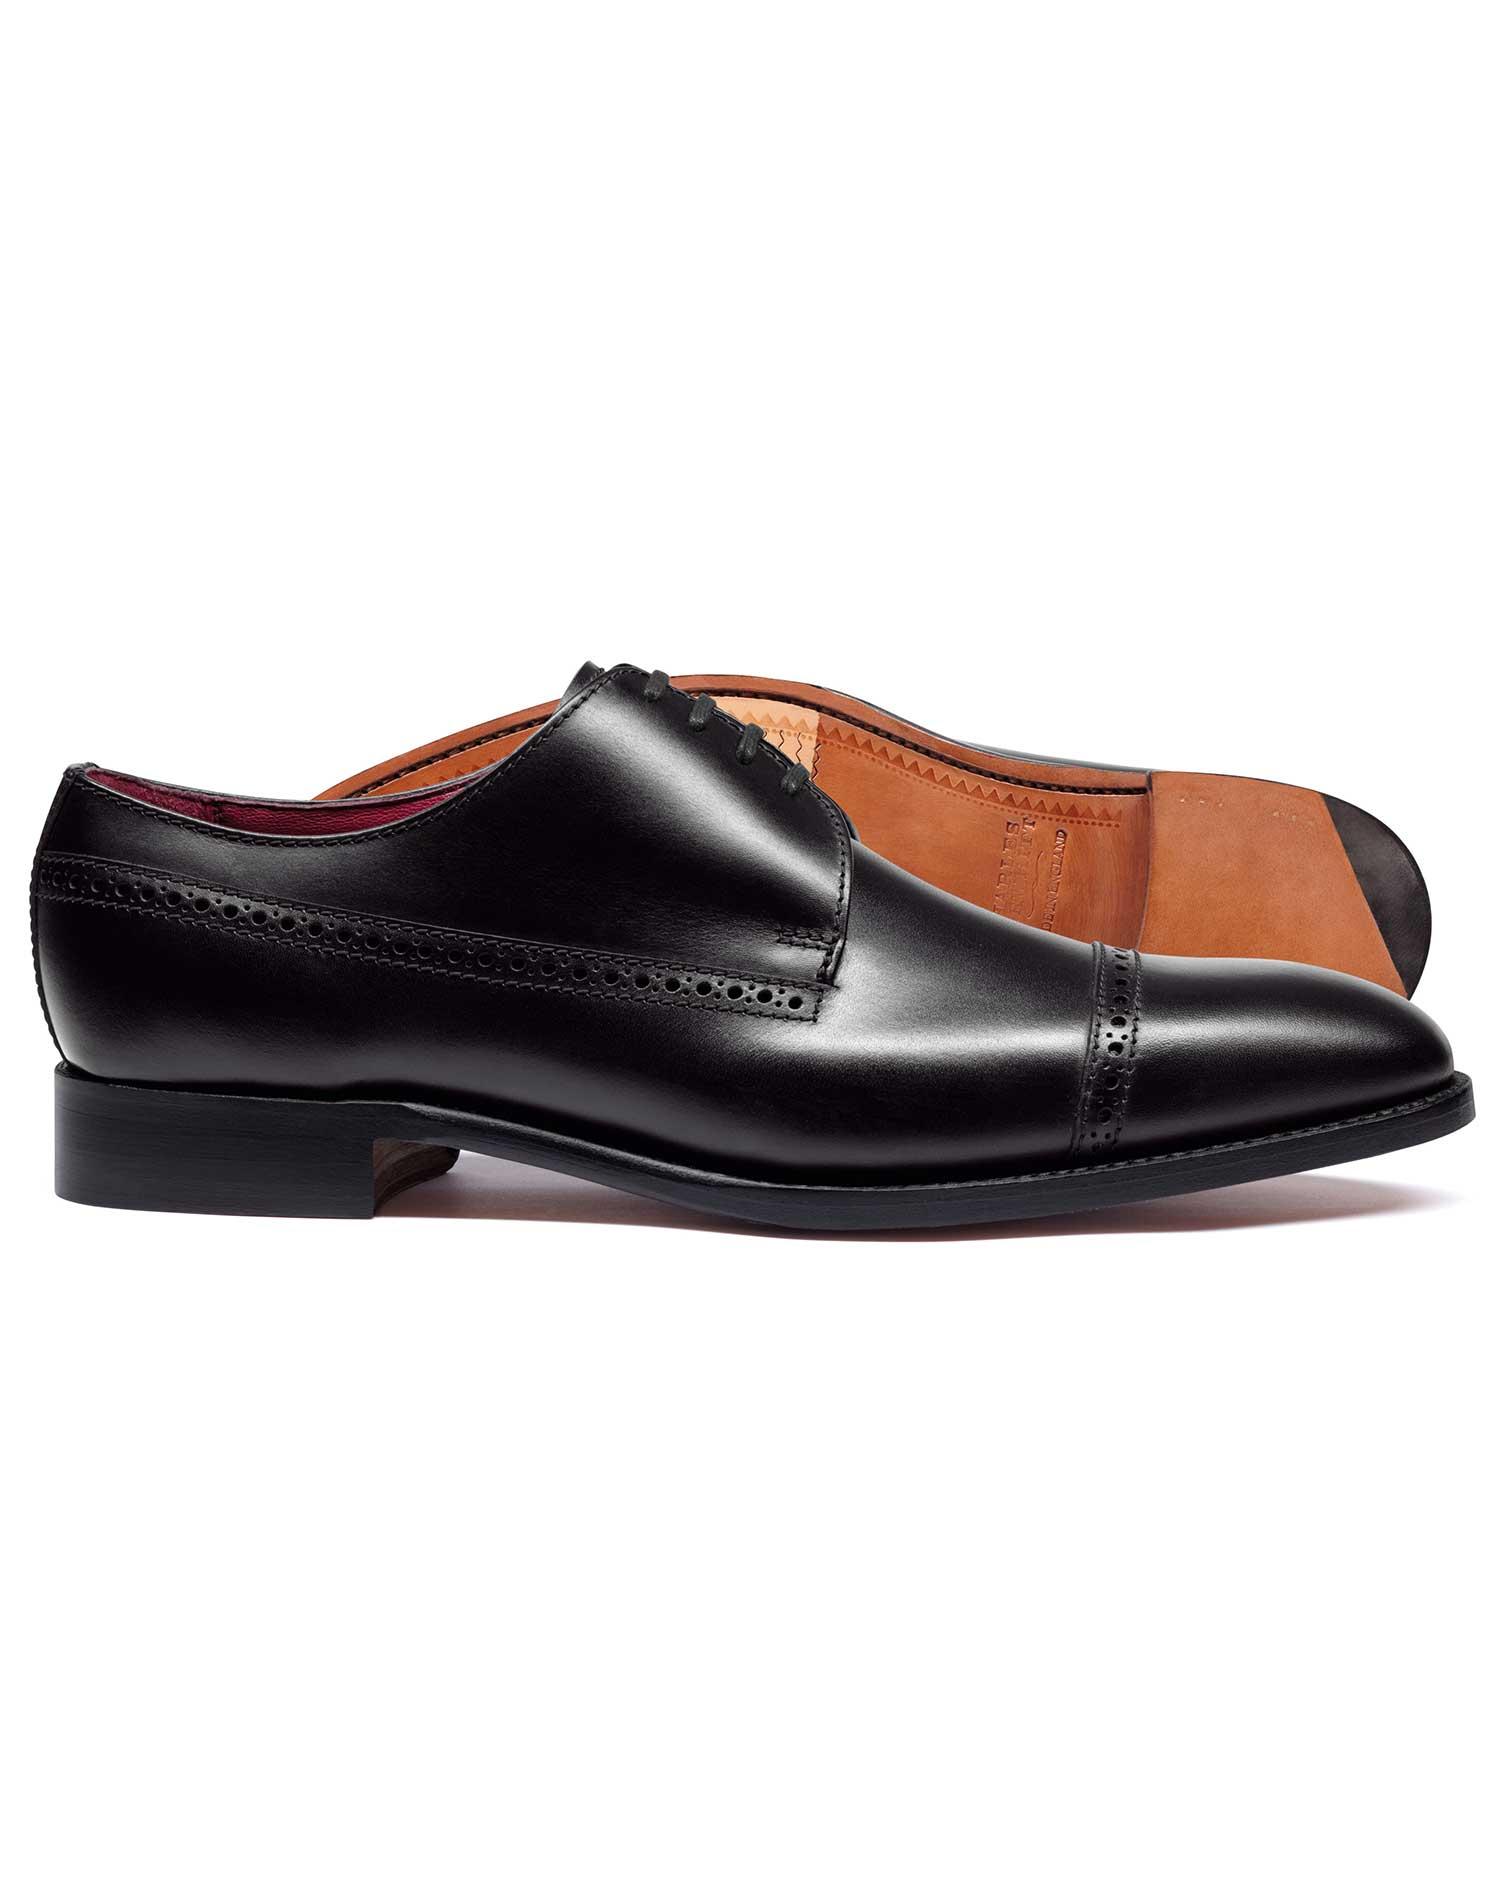 Black Made In England Derby Brogue Toe Cap Flex Sole Shoe Size 13 R by Charles Tyrwhitt